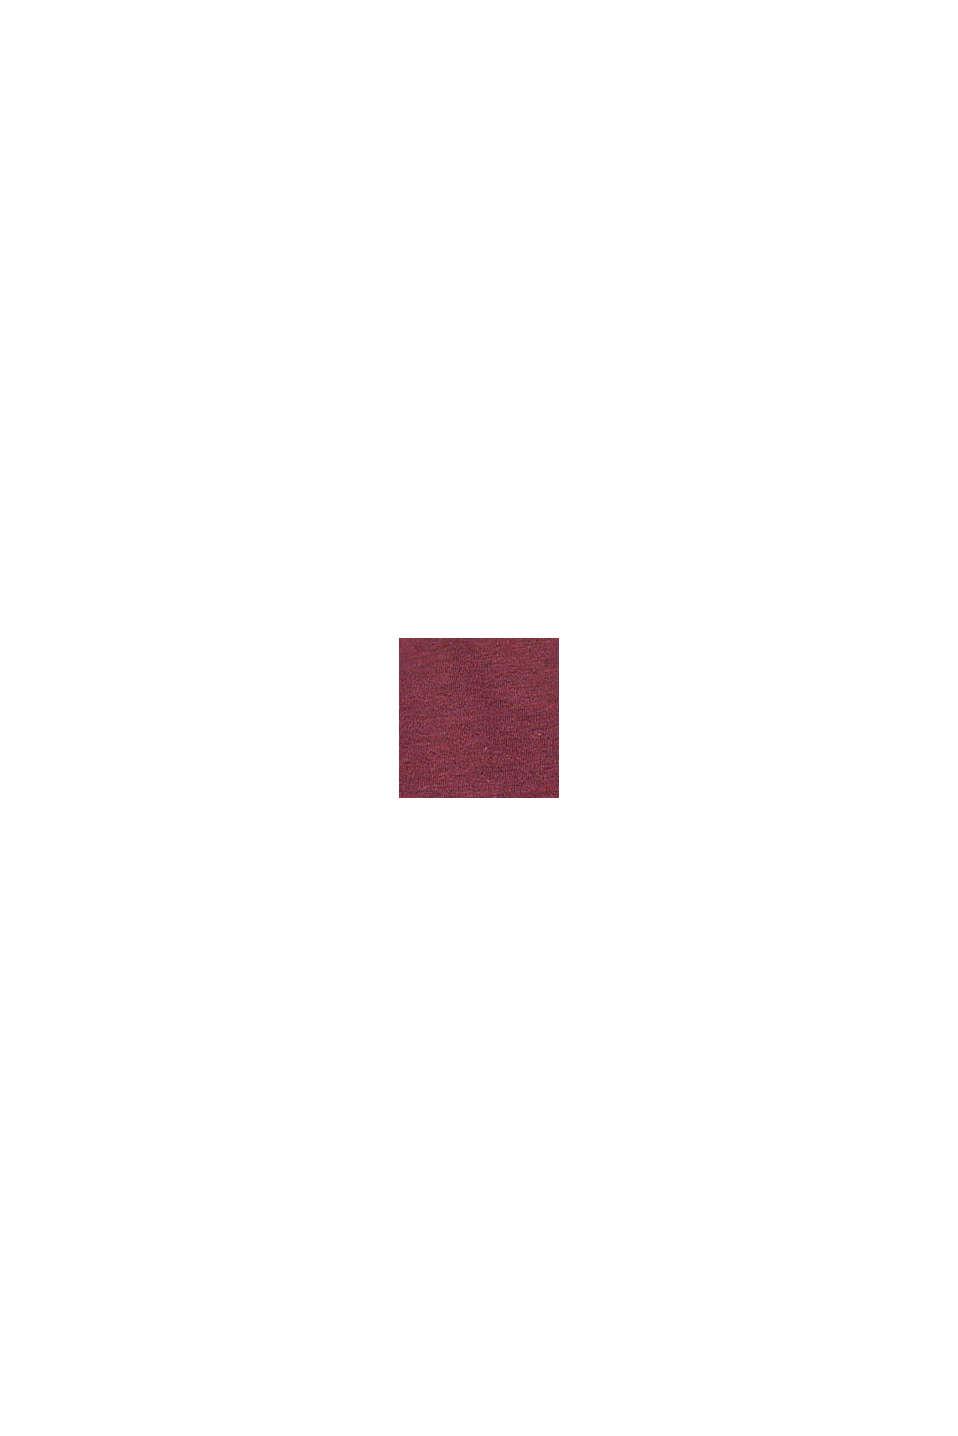 Jersey jurk met geplooide rok, PLUM RED, swatch